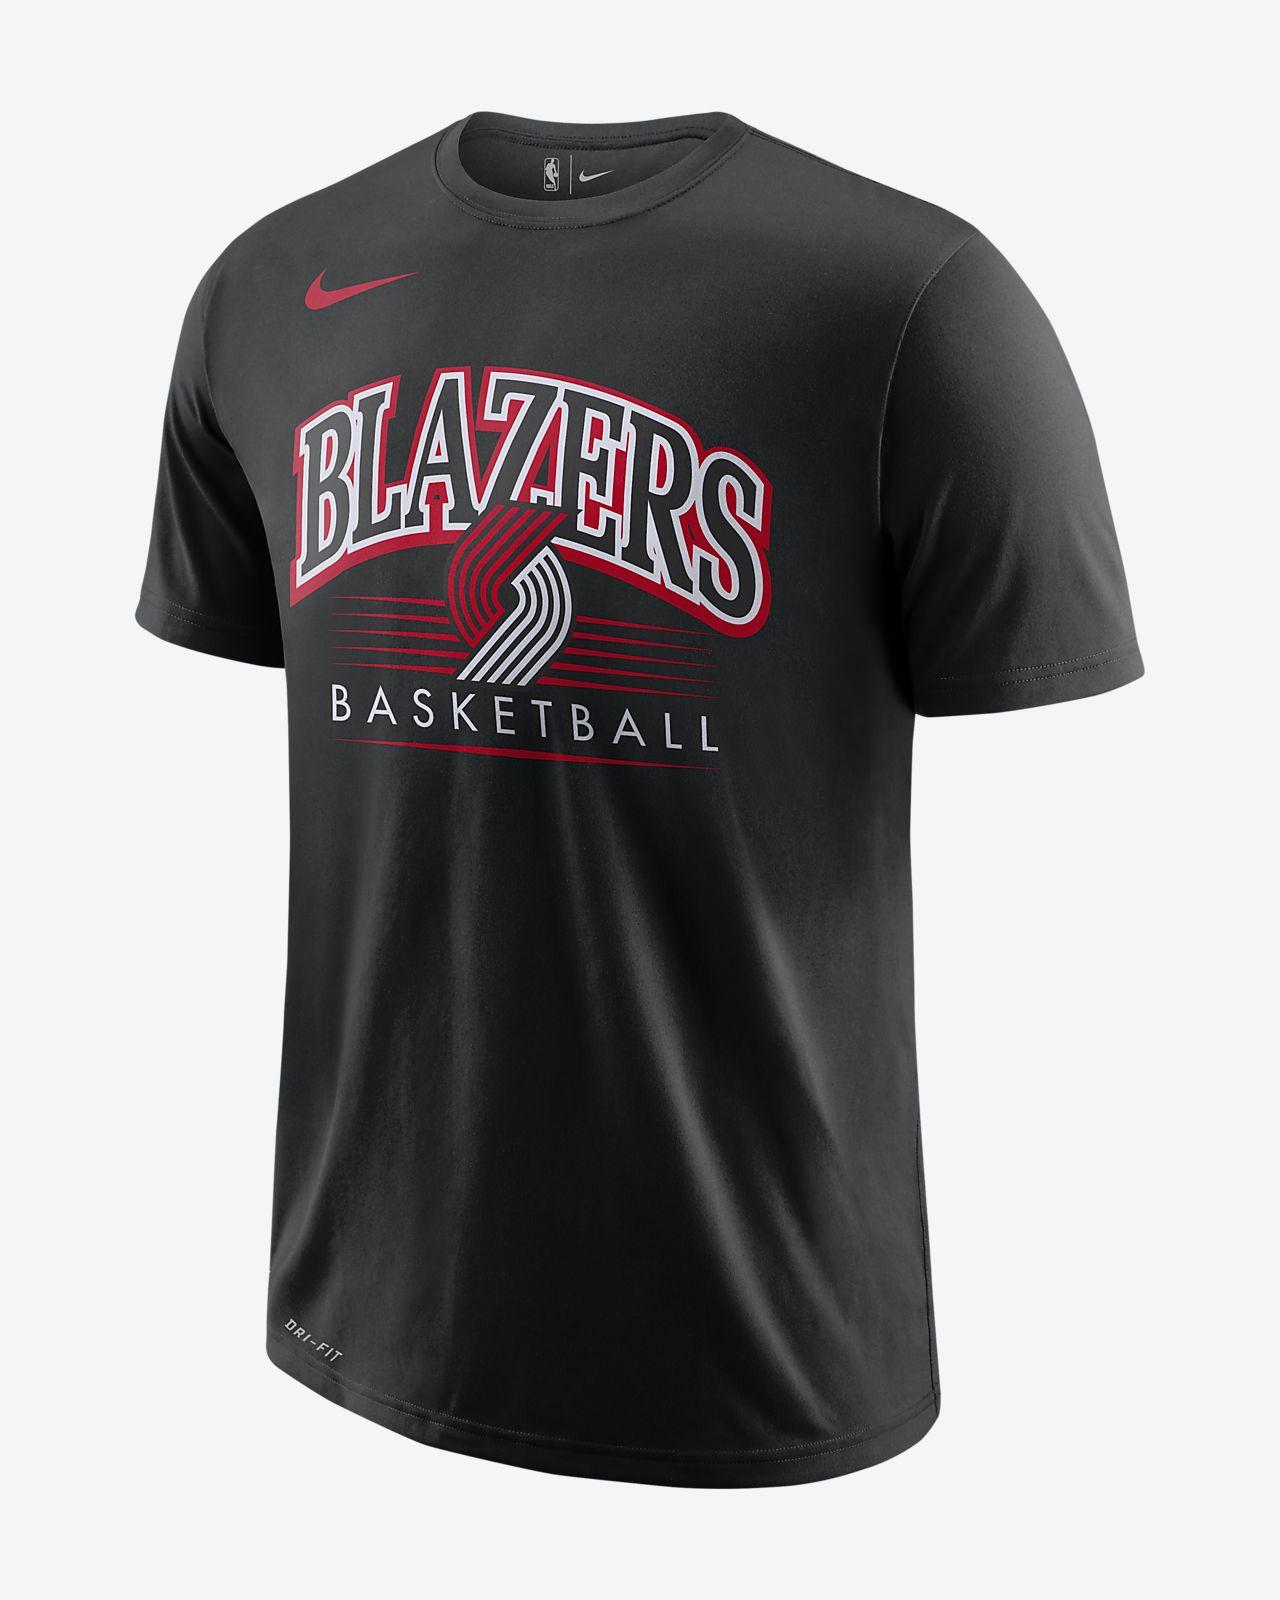 Dri Homme Trail Portland Pour Blazers Nba Nike Shirt Fit Tee 7qzYnAt